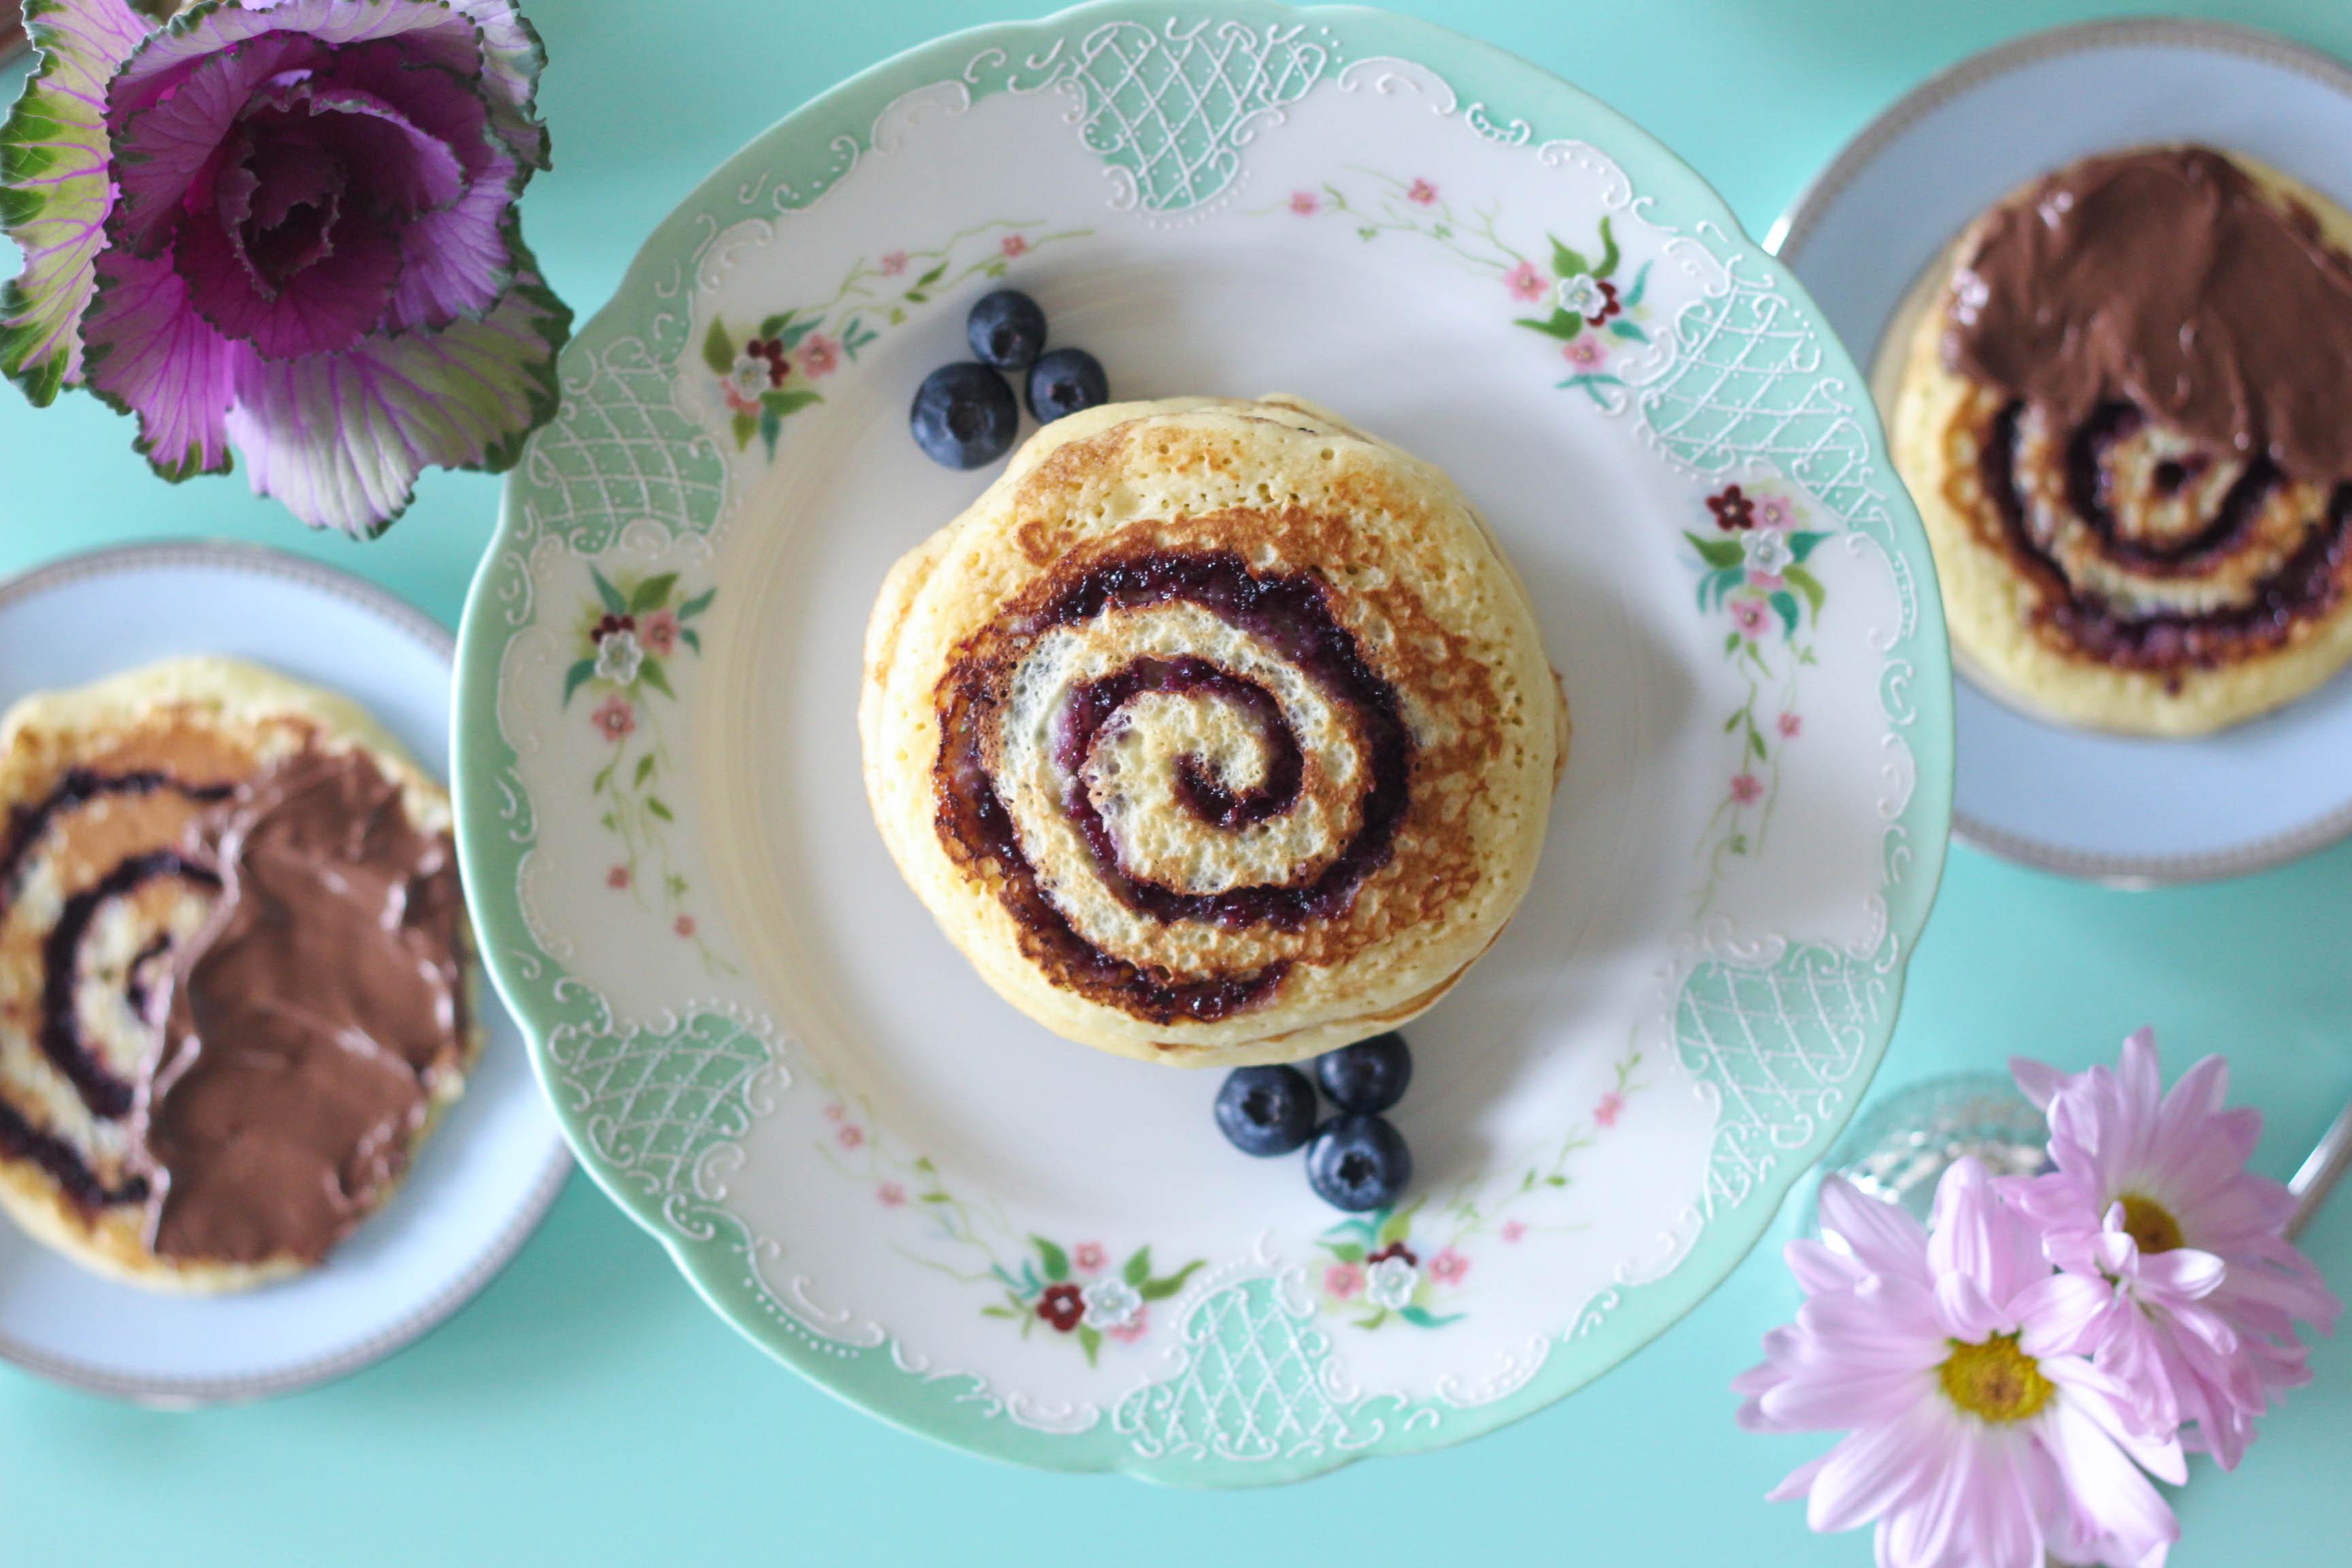 Blueberry Swirl Pancakes, Nutella, Hazelnut Spread, Pancakes